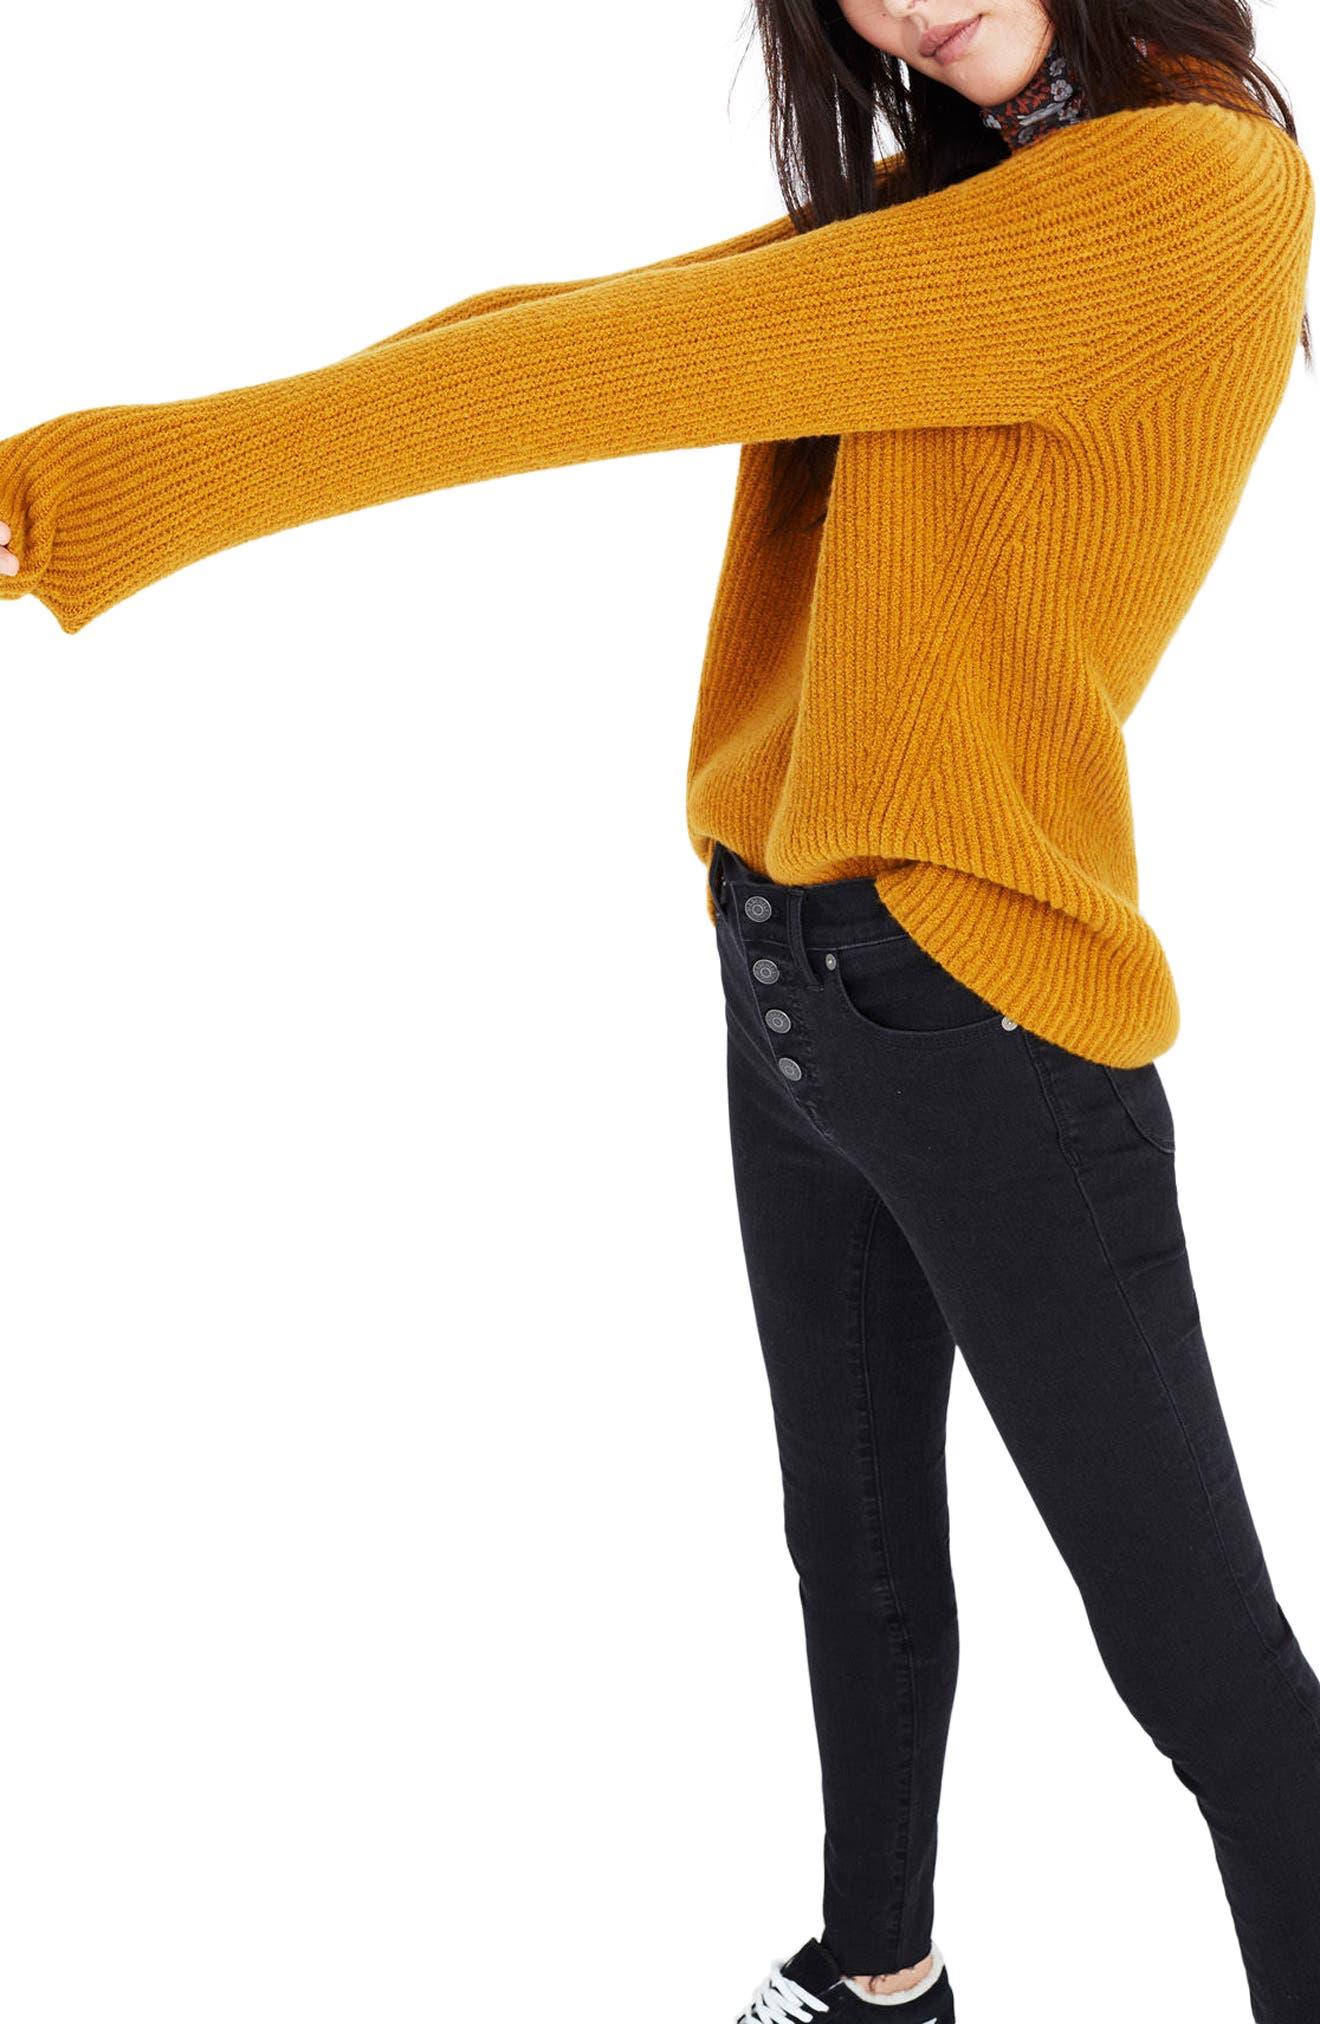 MADEWELL, Northfield Mock Neck Sweater, Alternate thumbnail 3, color, 800